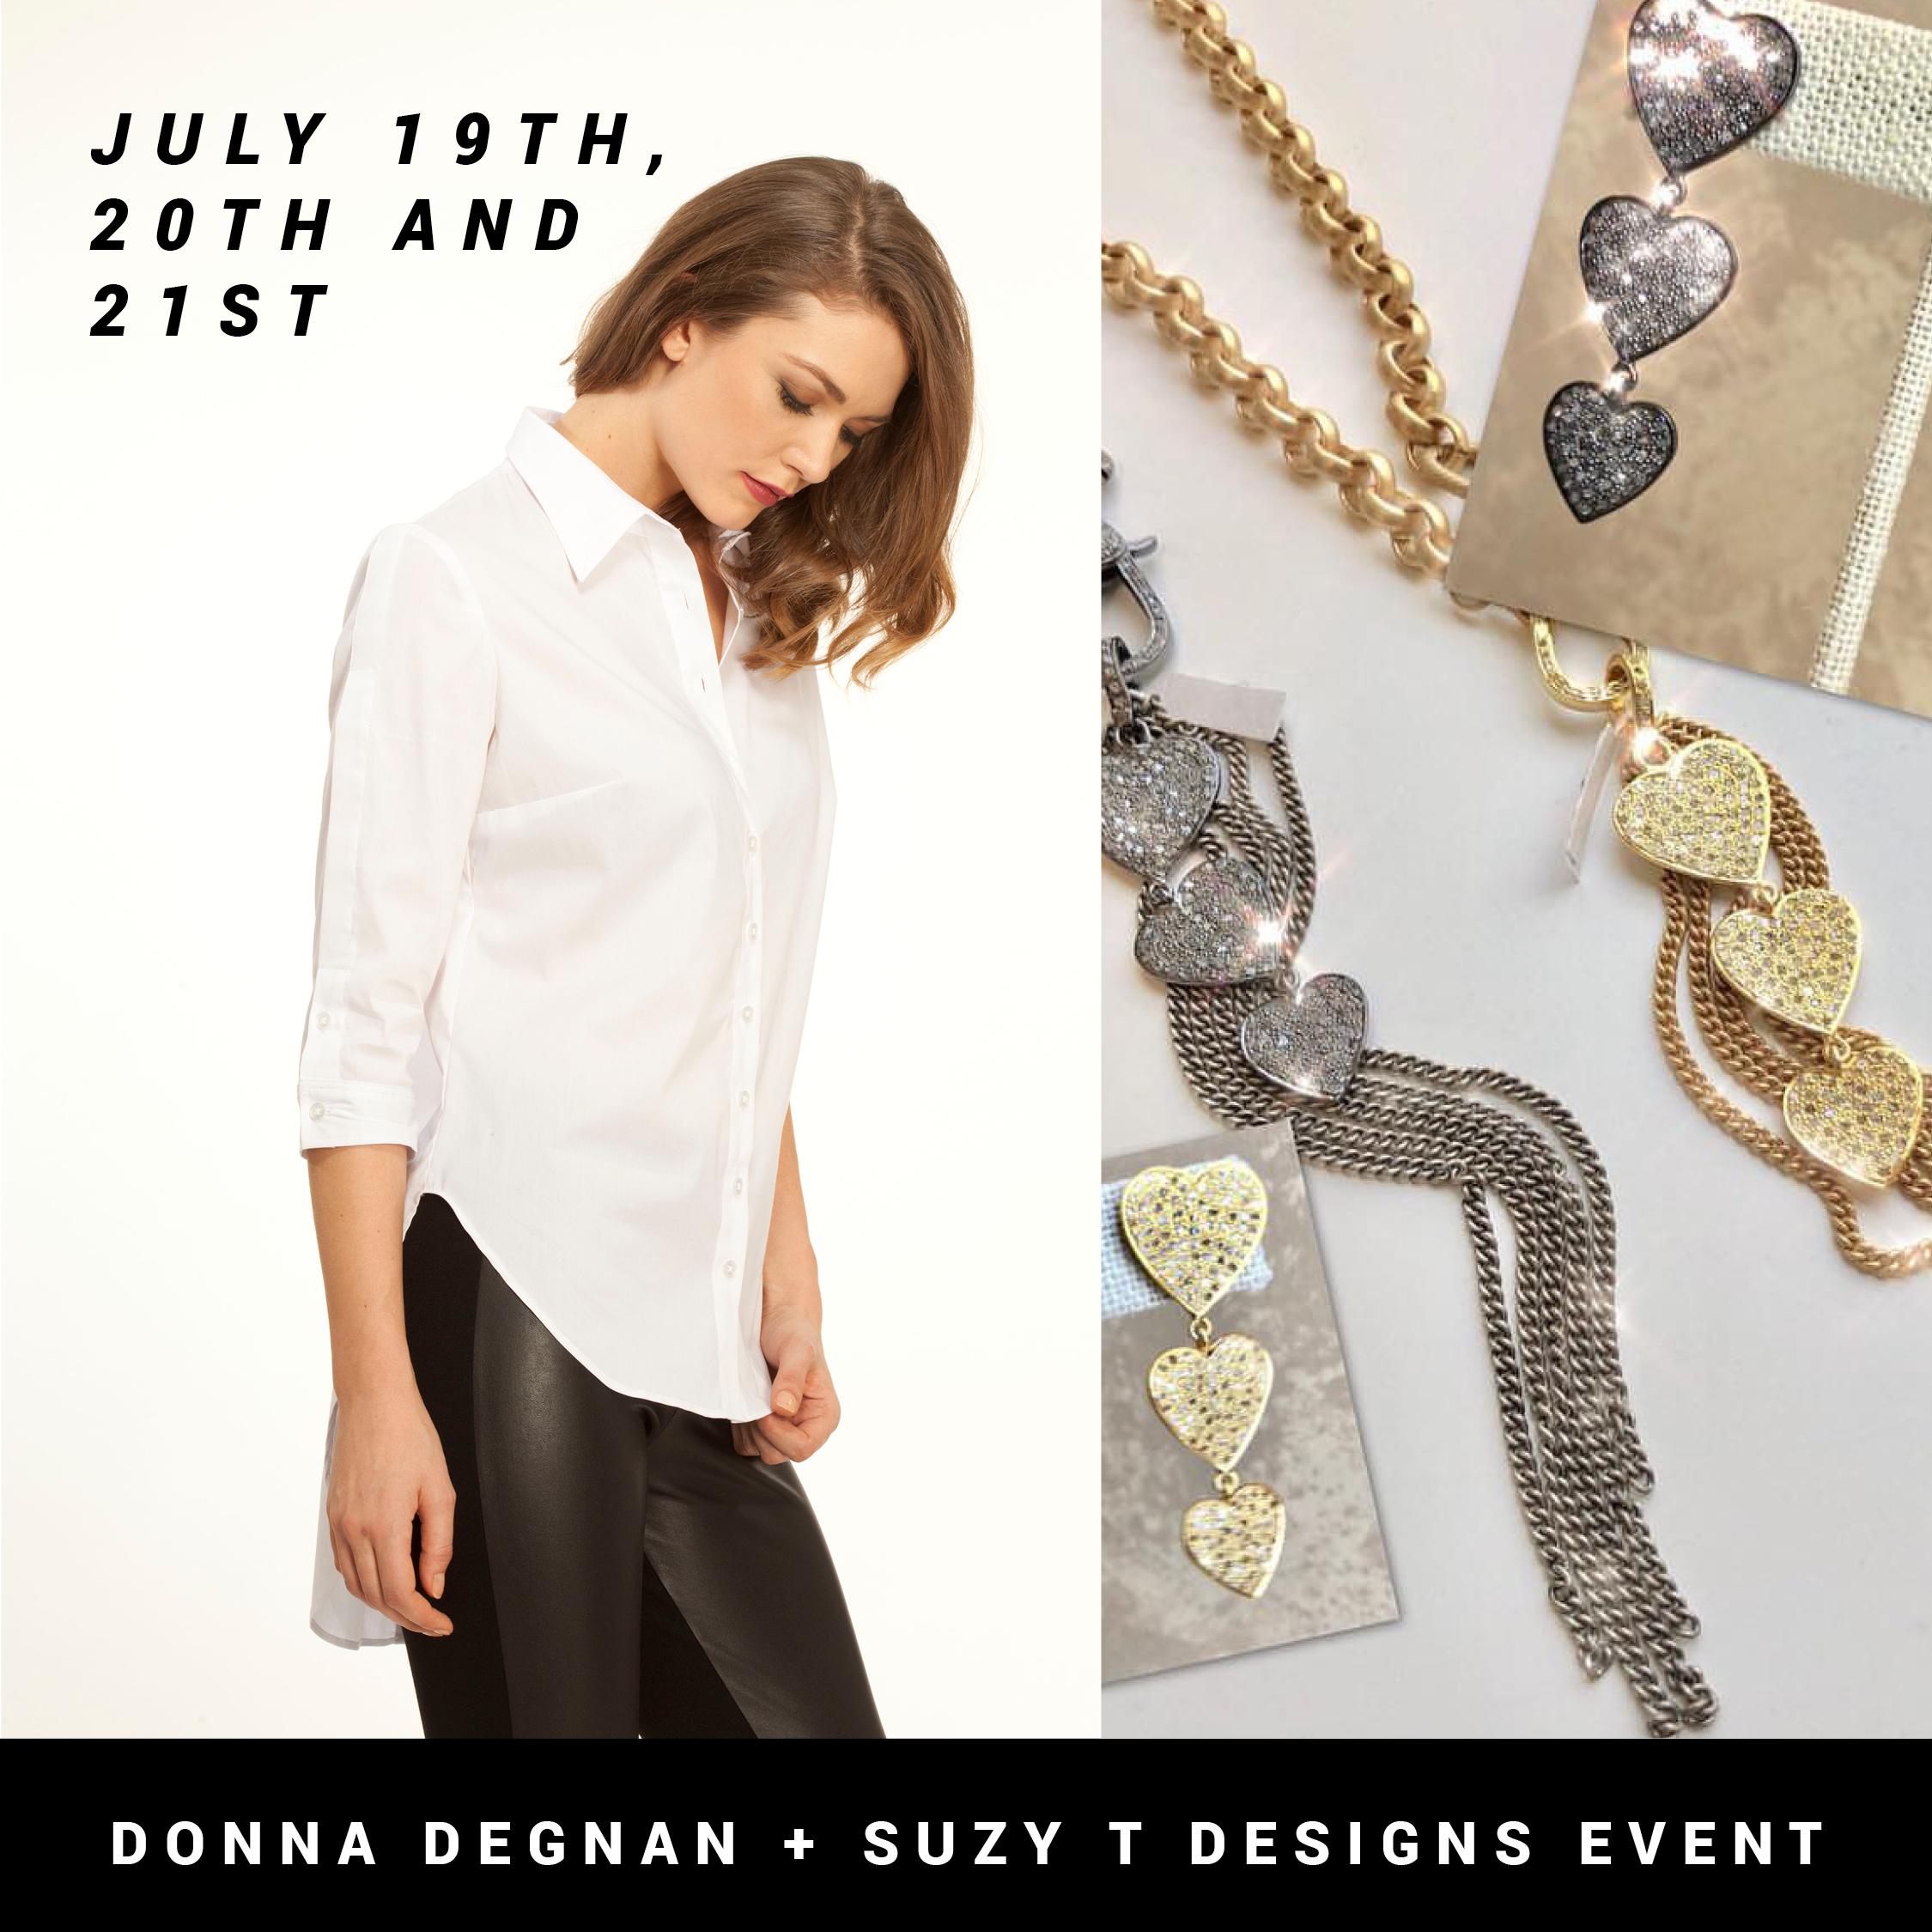 Donna Degnan and Suzy T Designs Event